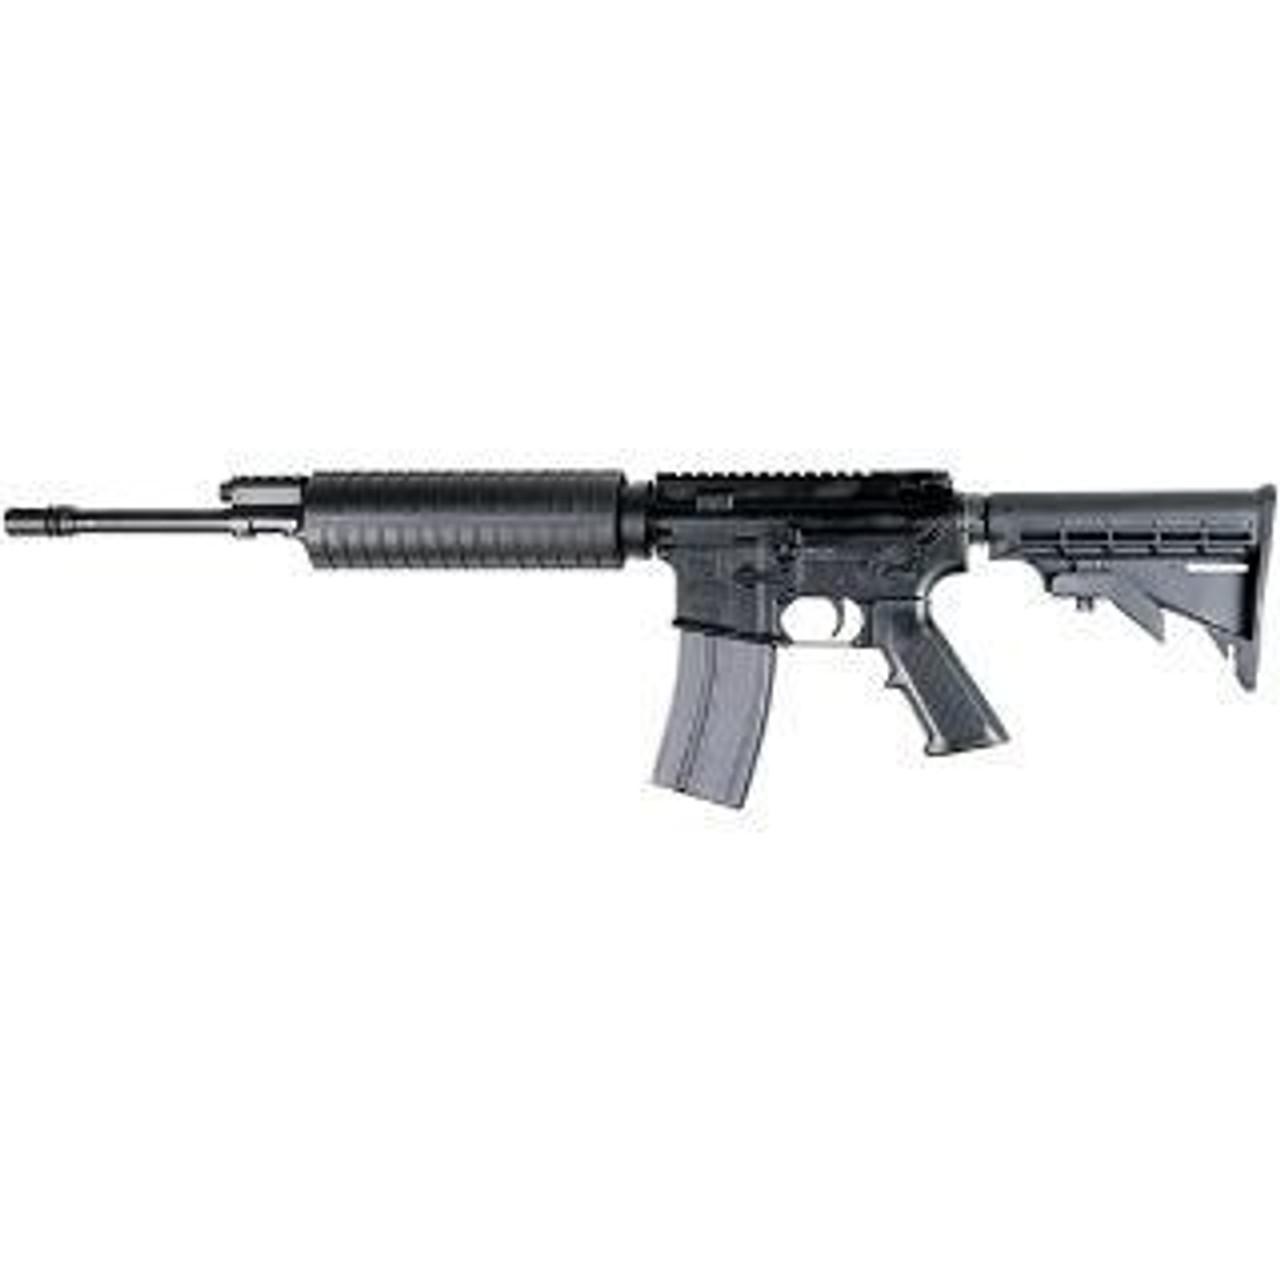 Adams Arms Base MidlLength CALIFORNIA LEGAL - 5.56